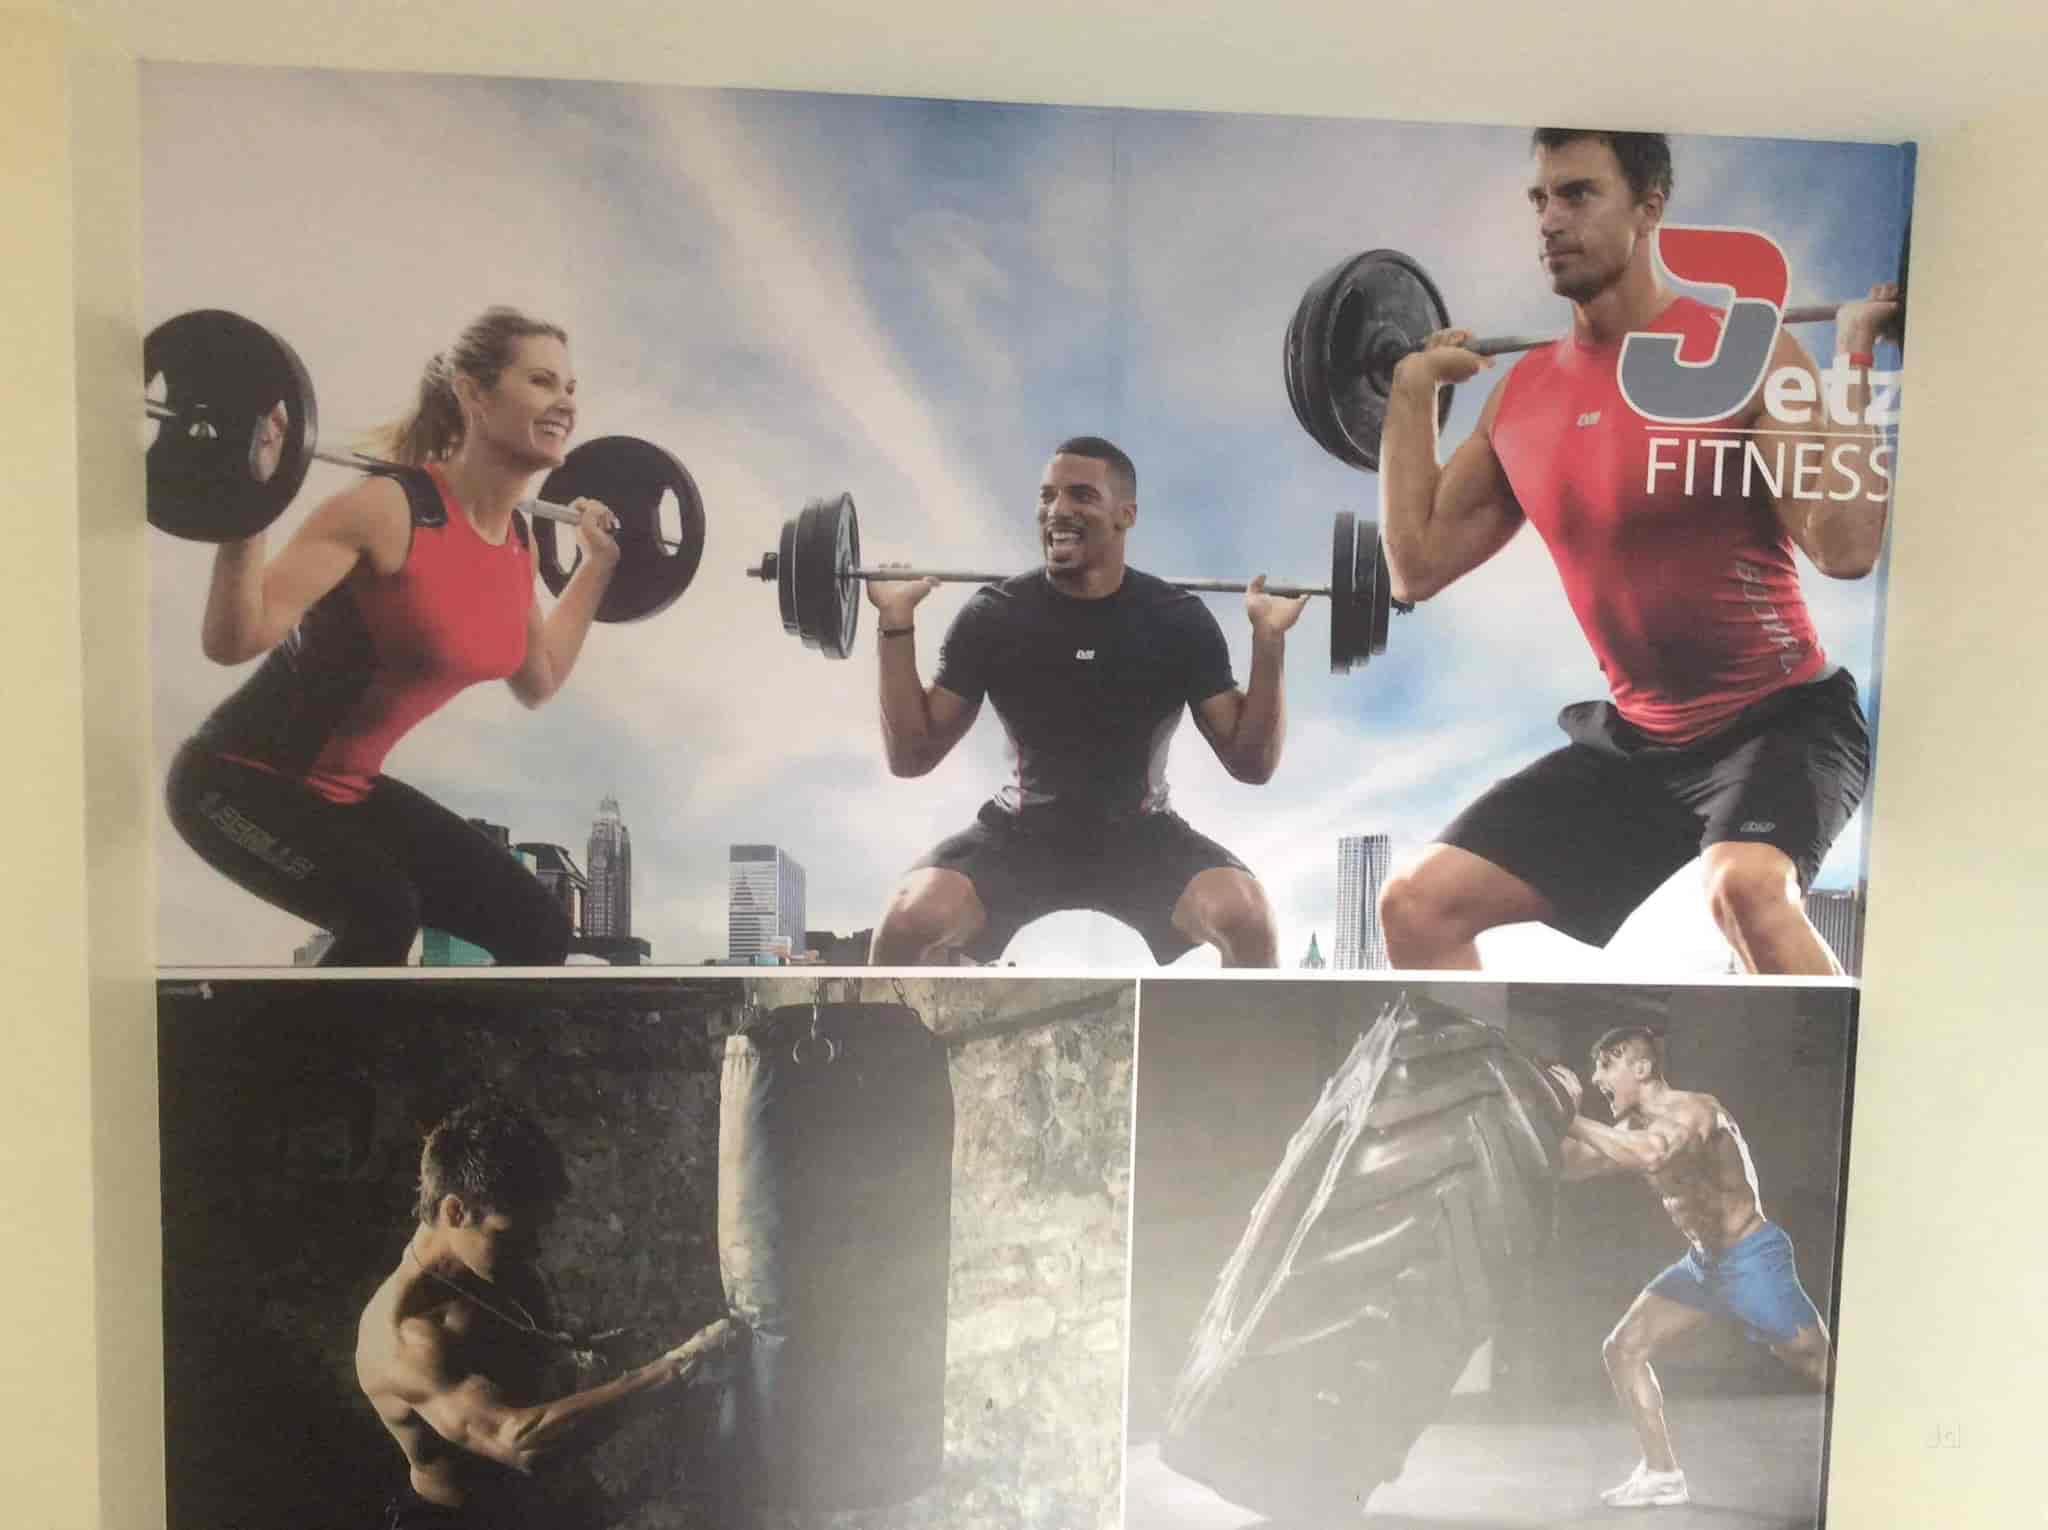 Jetz Fitness Thambuchetty Palya Gyms In Bangalore Justdial Iron Gym